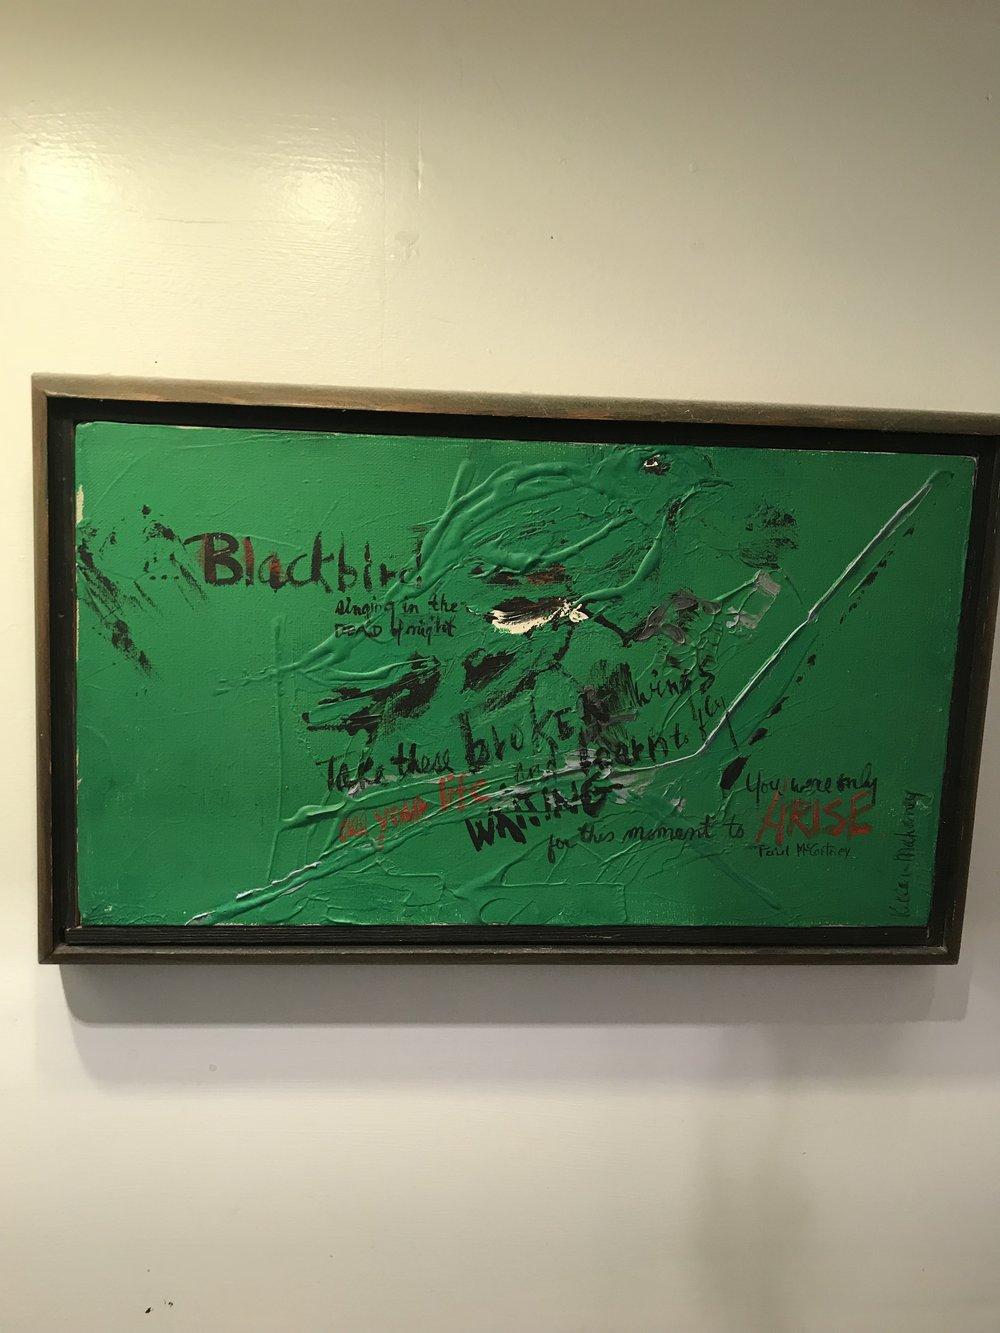 Blackbird (1975)